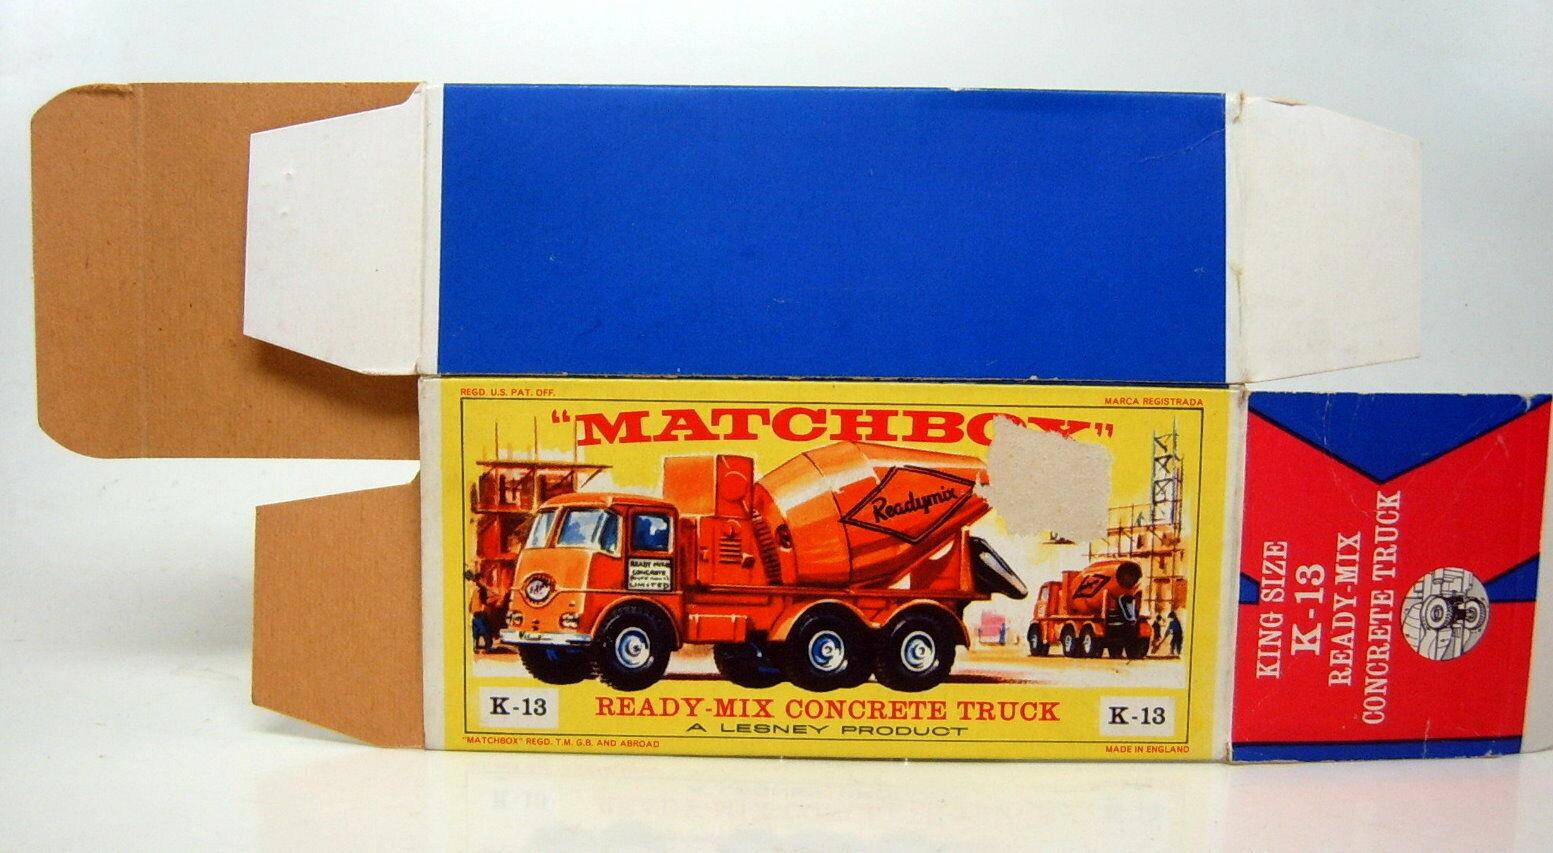 Matchbox KingGröße K-13A Readymix Concrete Truck leere  E1  Box